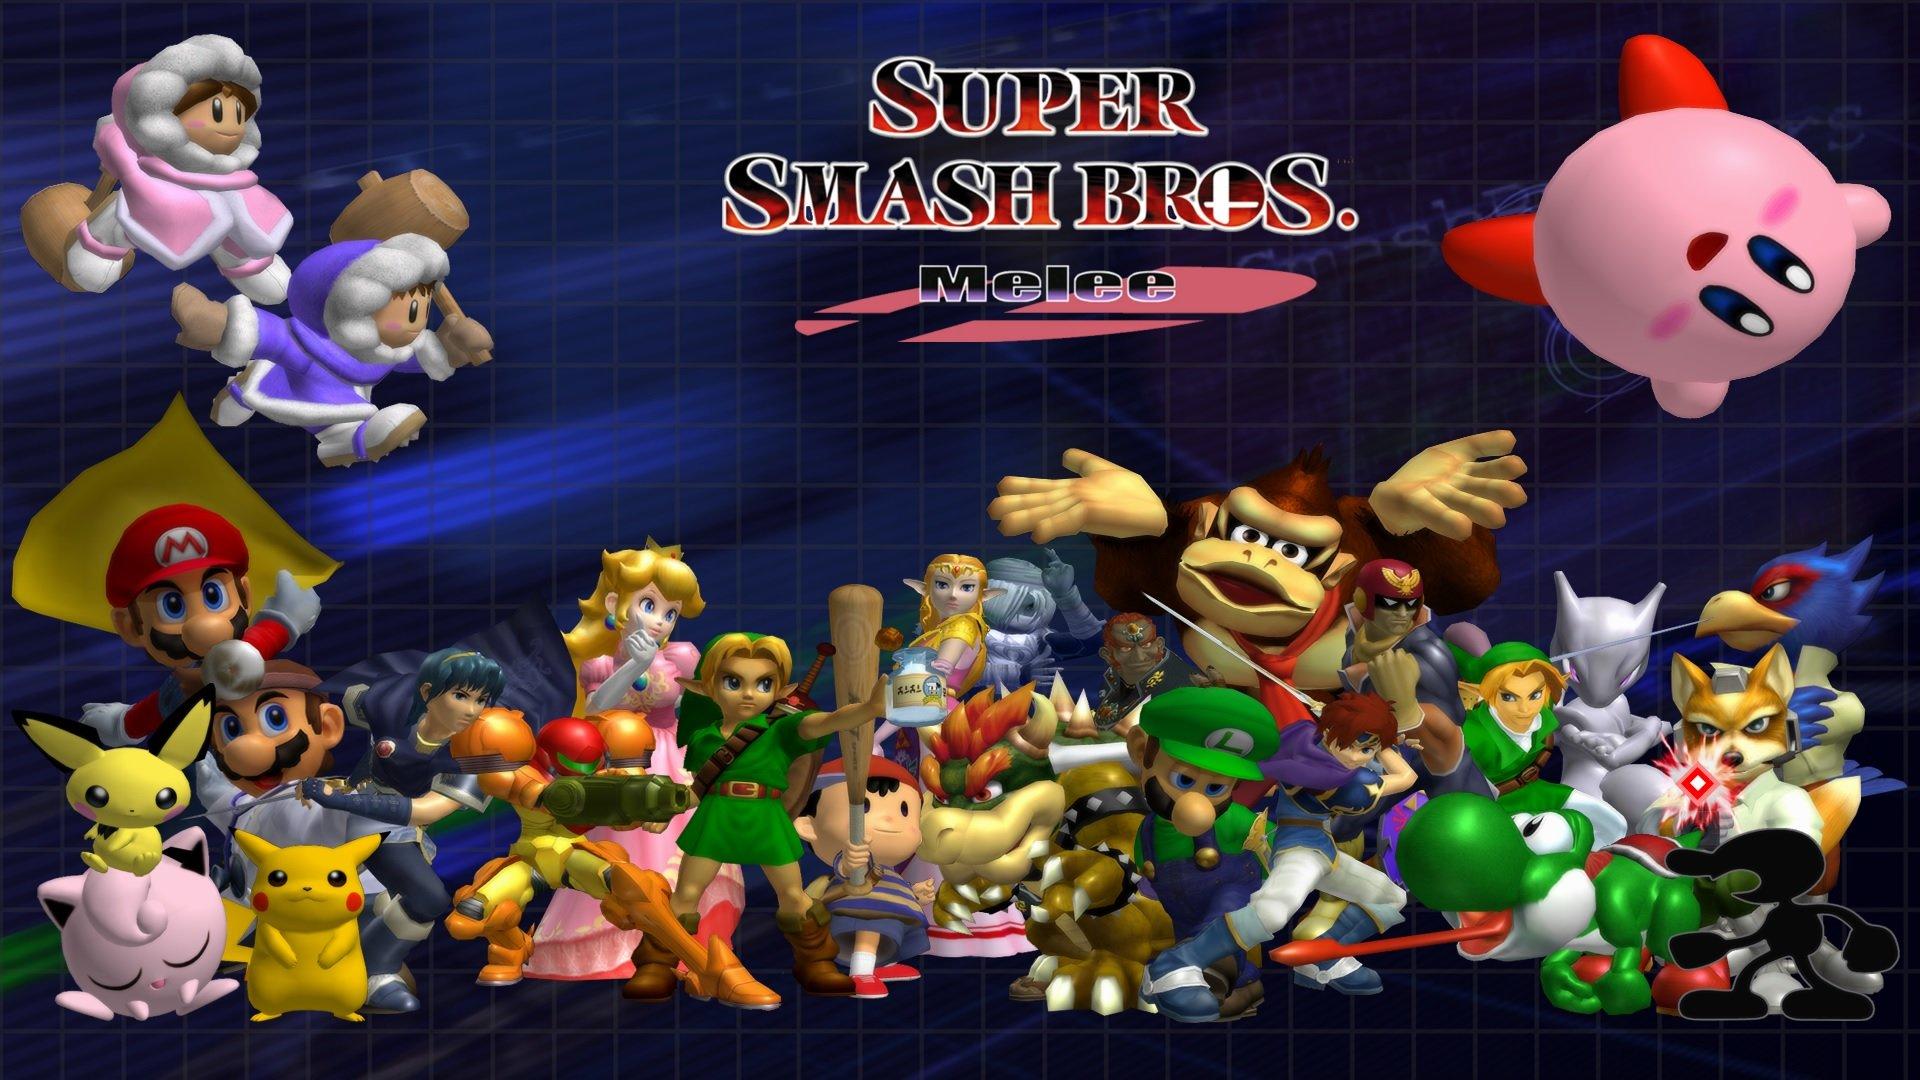 Super Smash Bros Melee Wallpapers 1920x1080 Full Hd 1080p